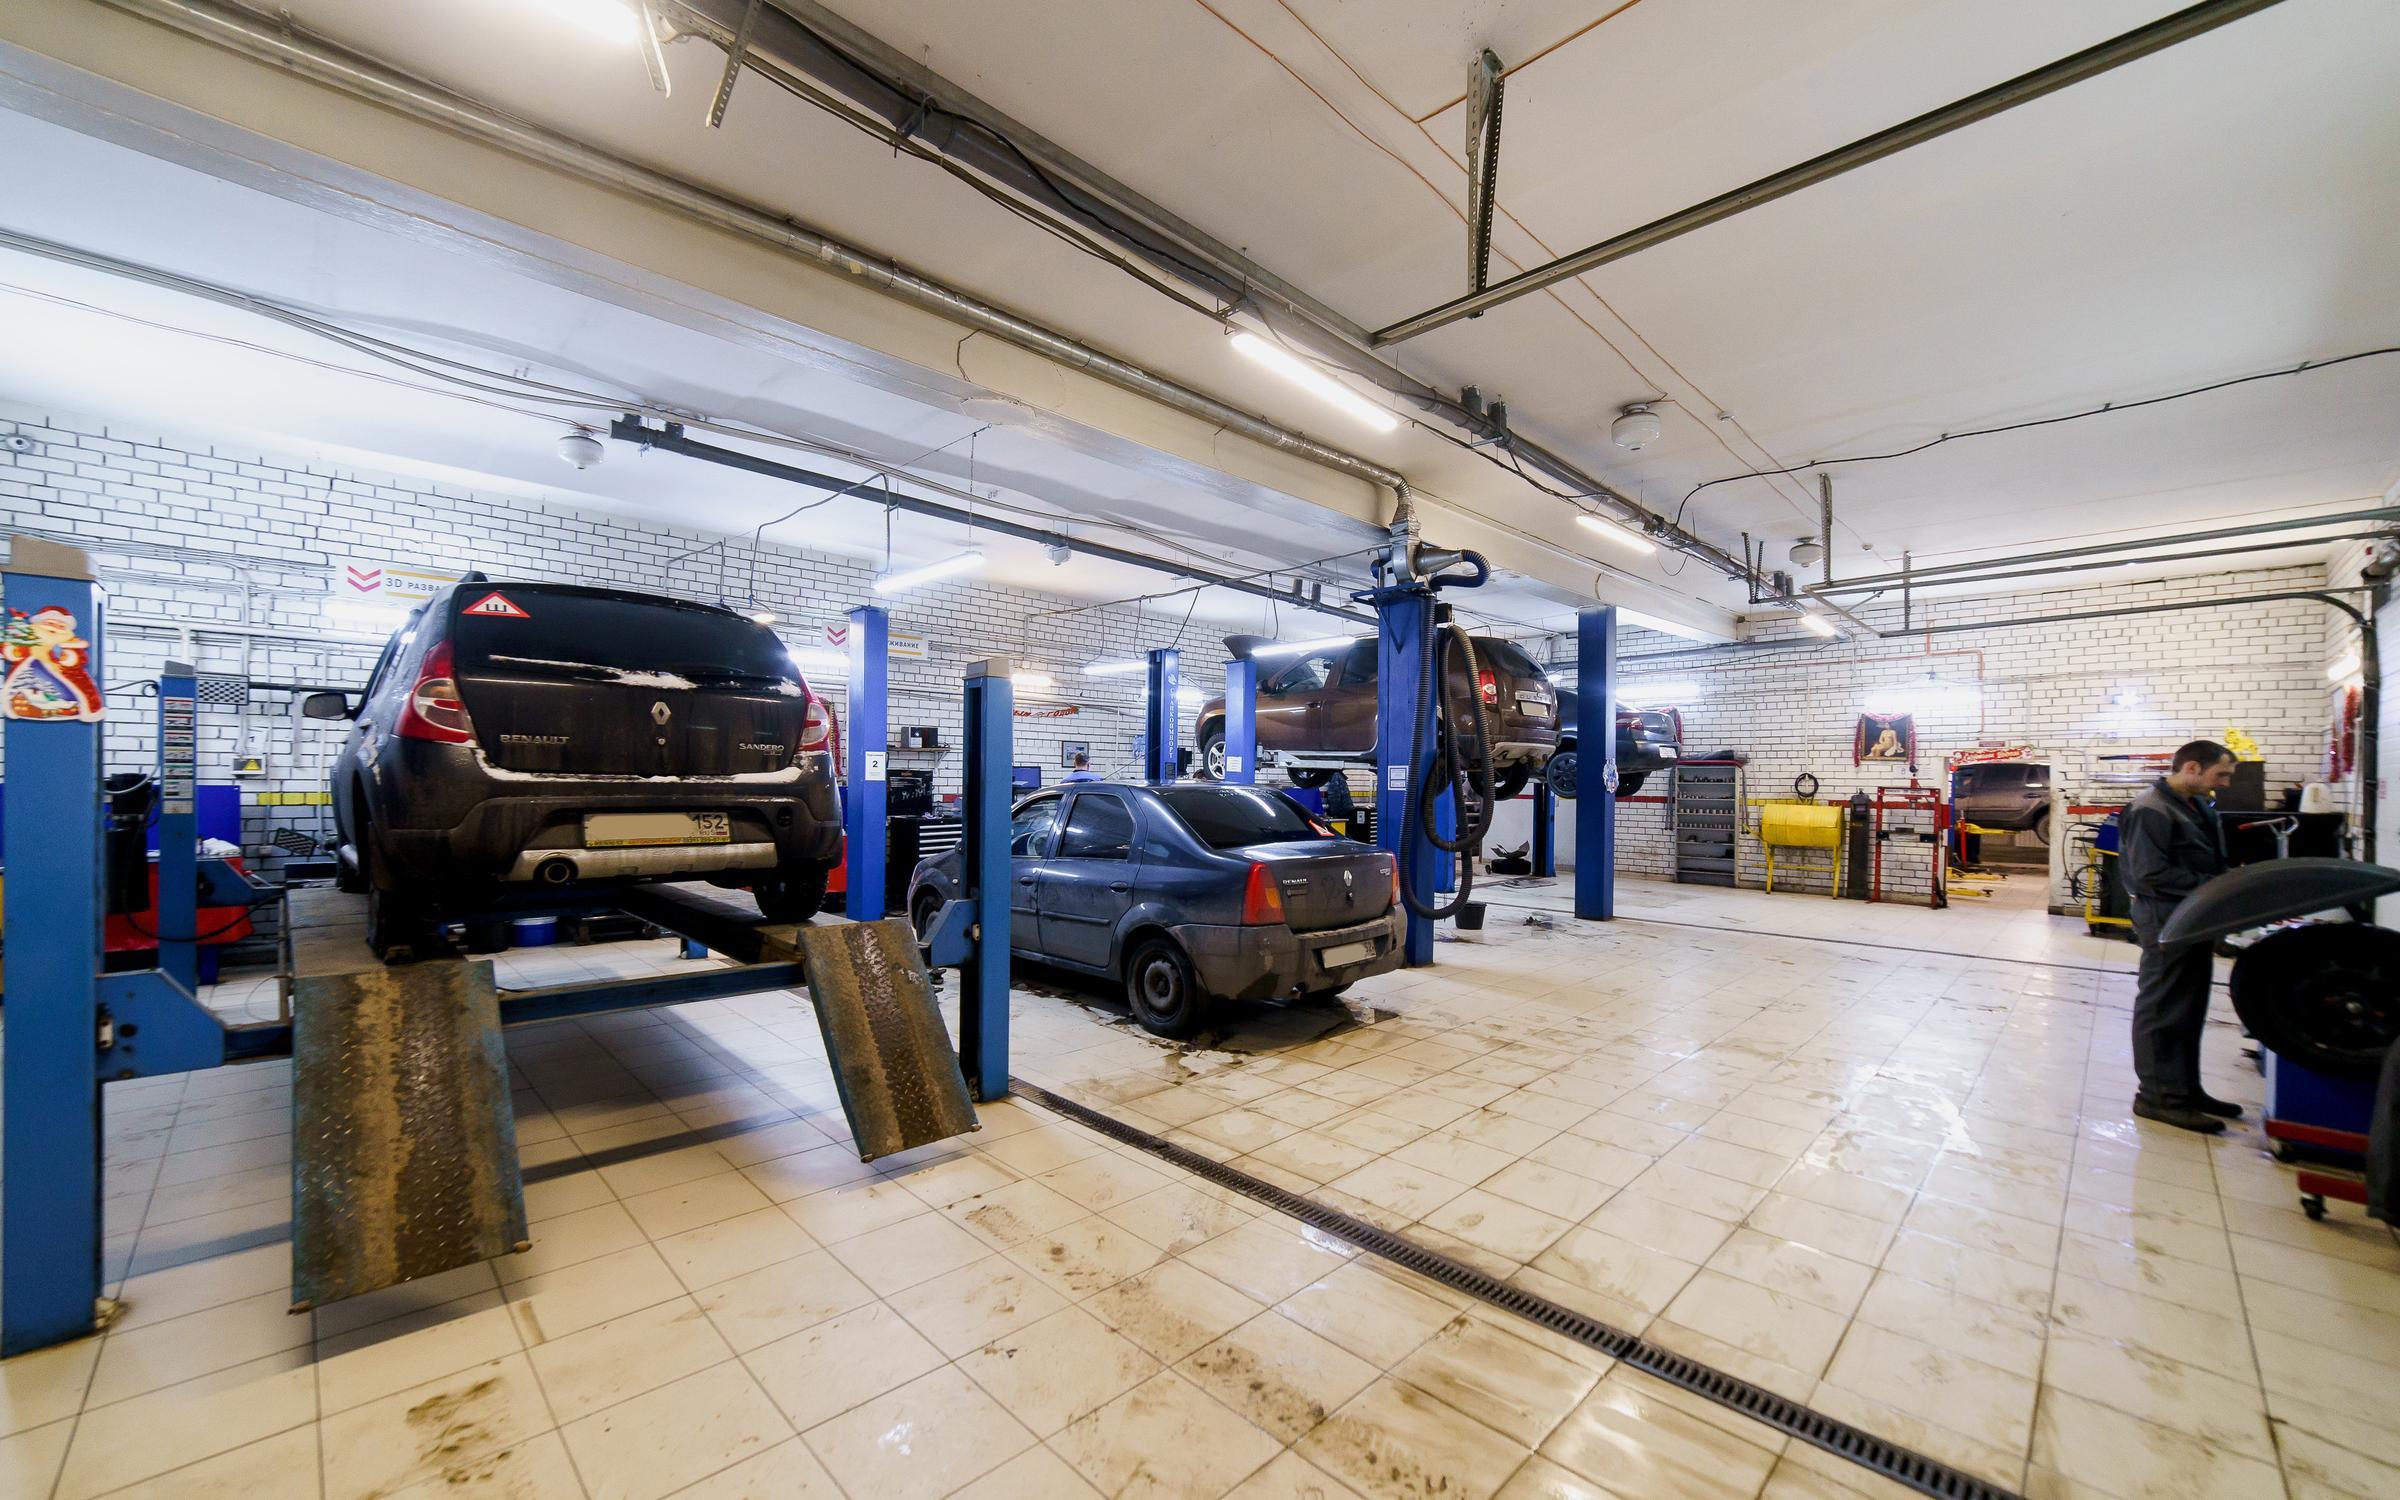 фотография Автокомплекса по ремонту Renault, Nissan и Infiniti САНРЕНО на улице Литвинова